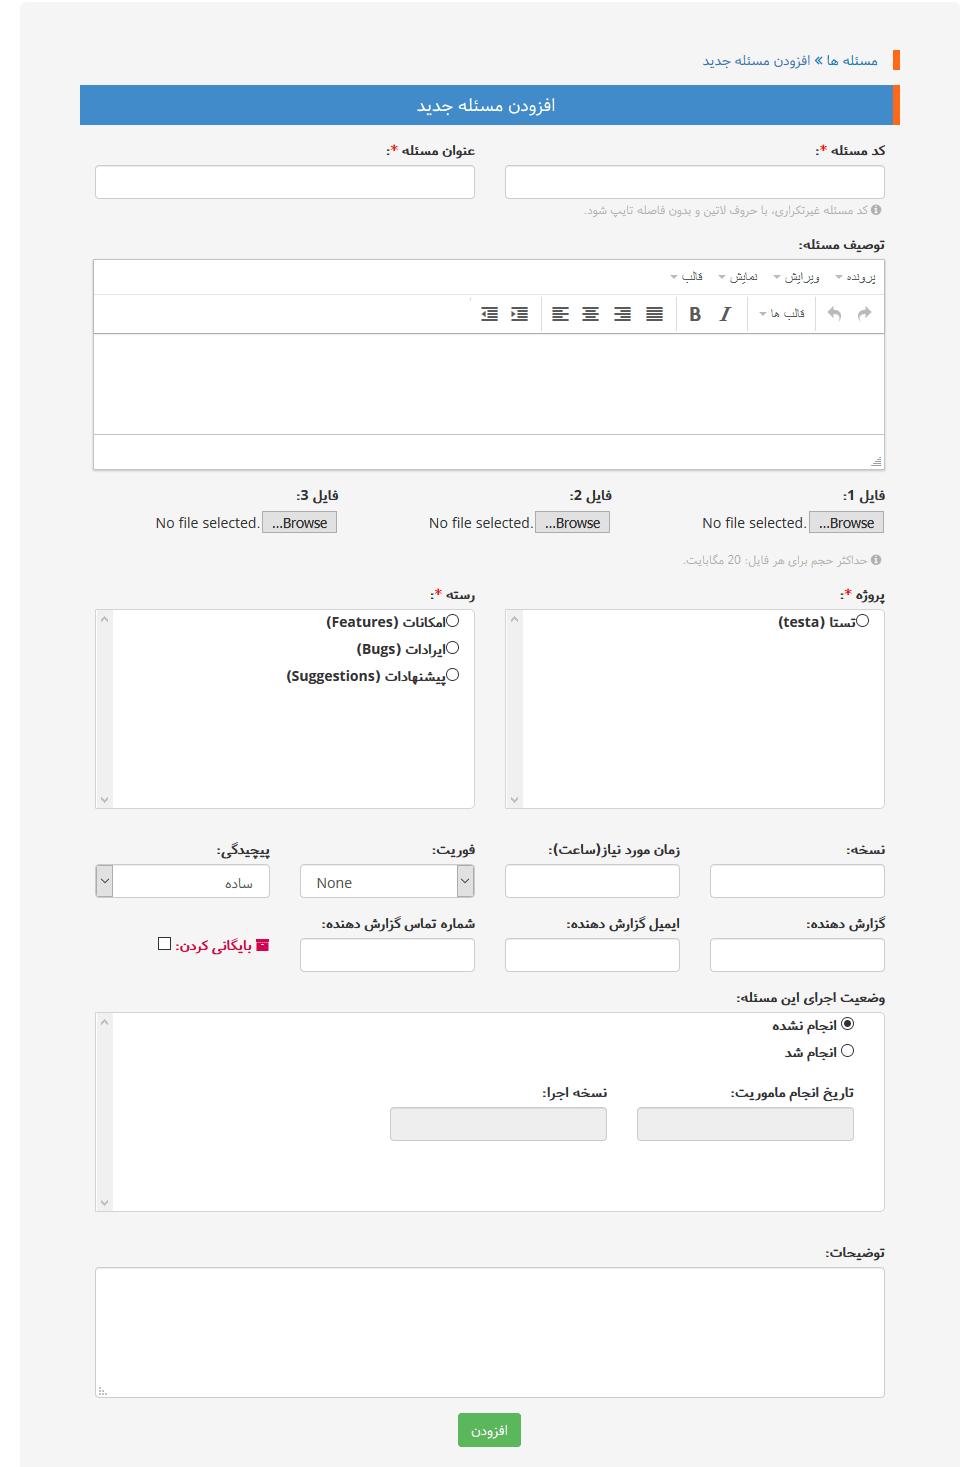 https://proja.aftab.cc/img/screenshot/proja_screenshot_3.png